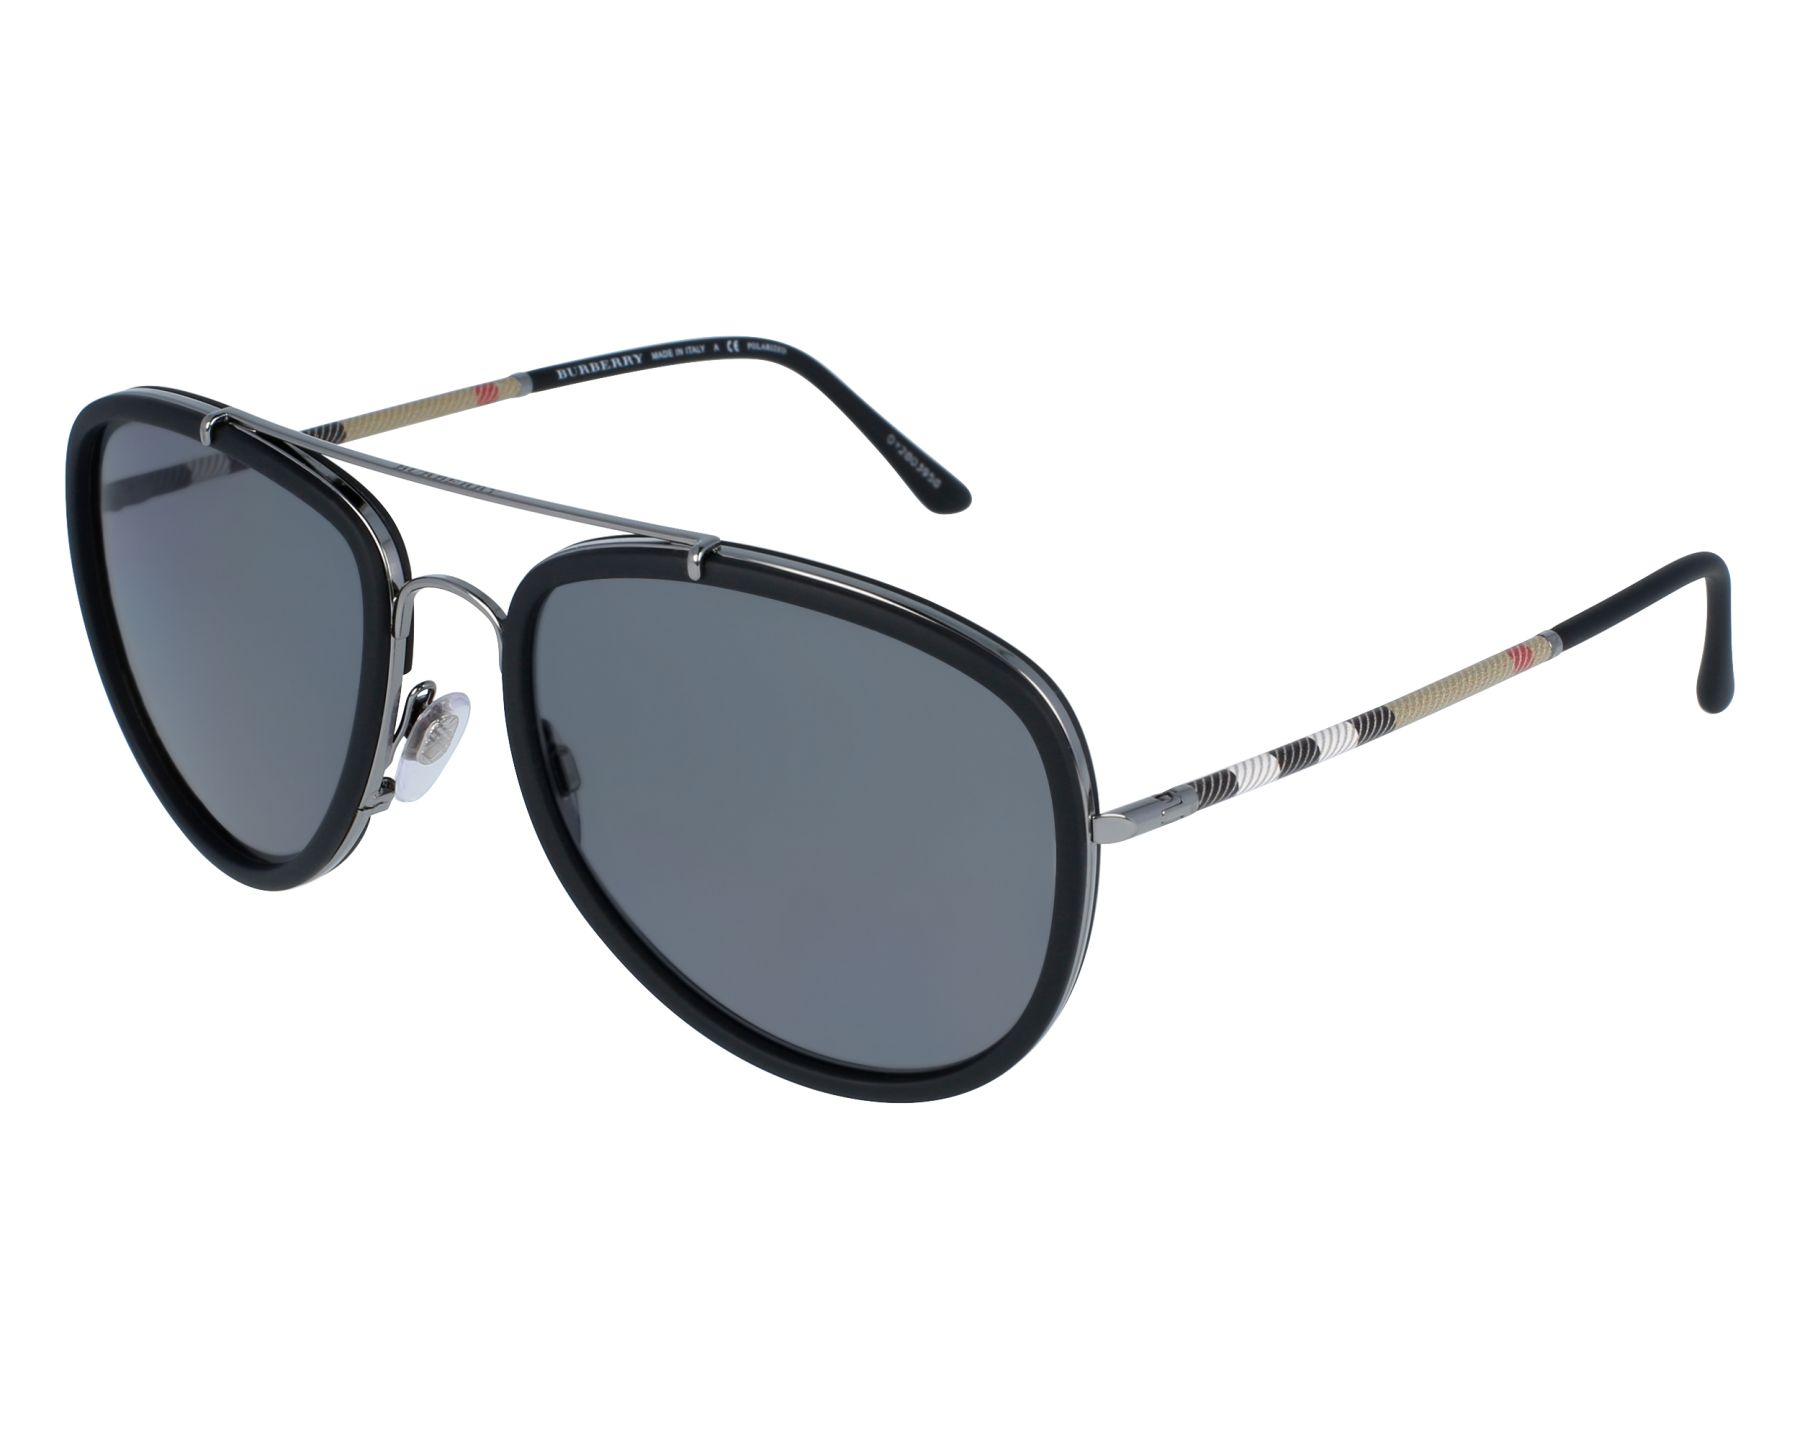 a0050e07f50 Sunglasses Burberry BE-3090-Q 1003 T8 58-18 Black Gun front